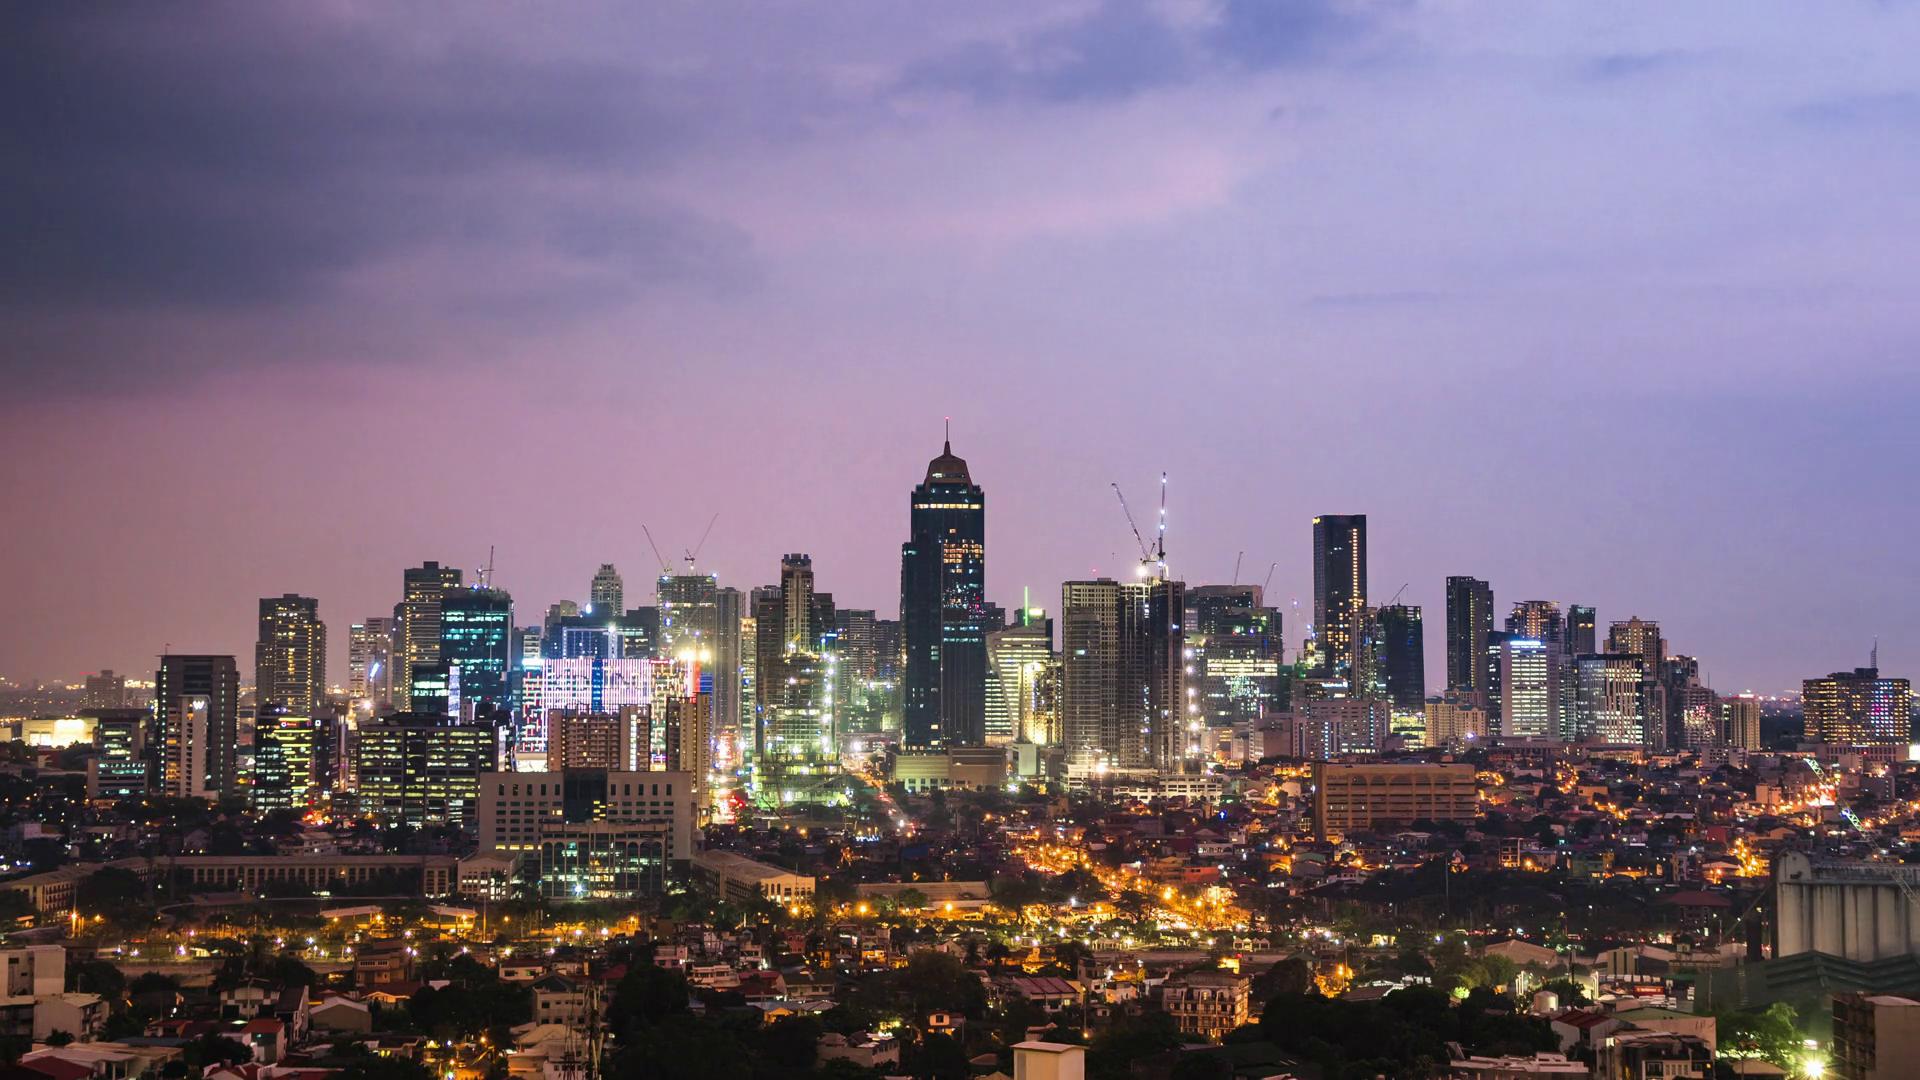 Day to Night Time Lapse View of Metro Manila Skyline 1920x1080